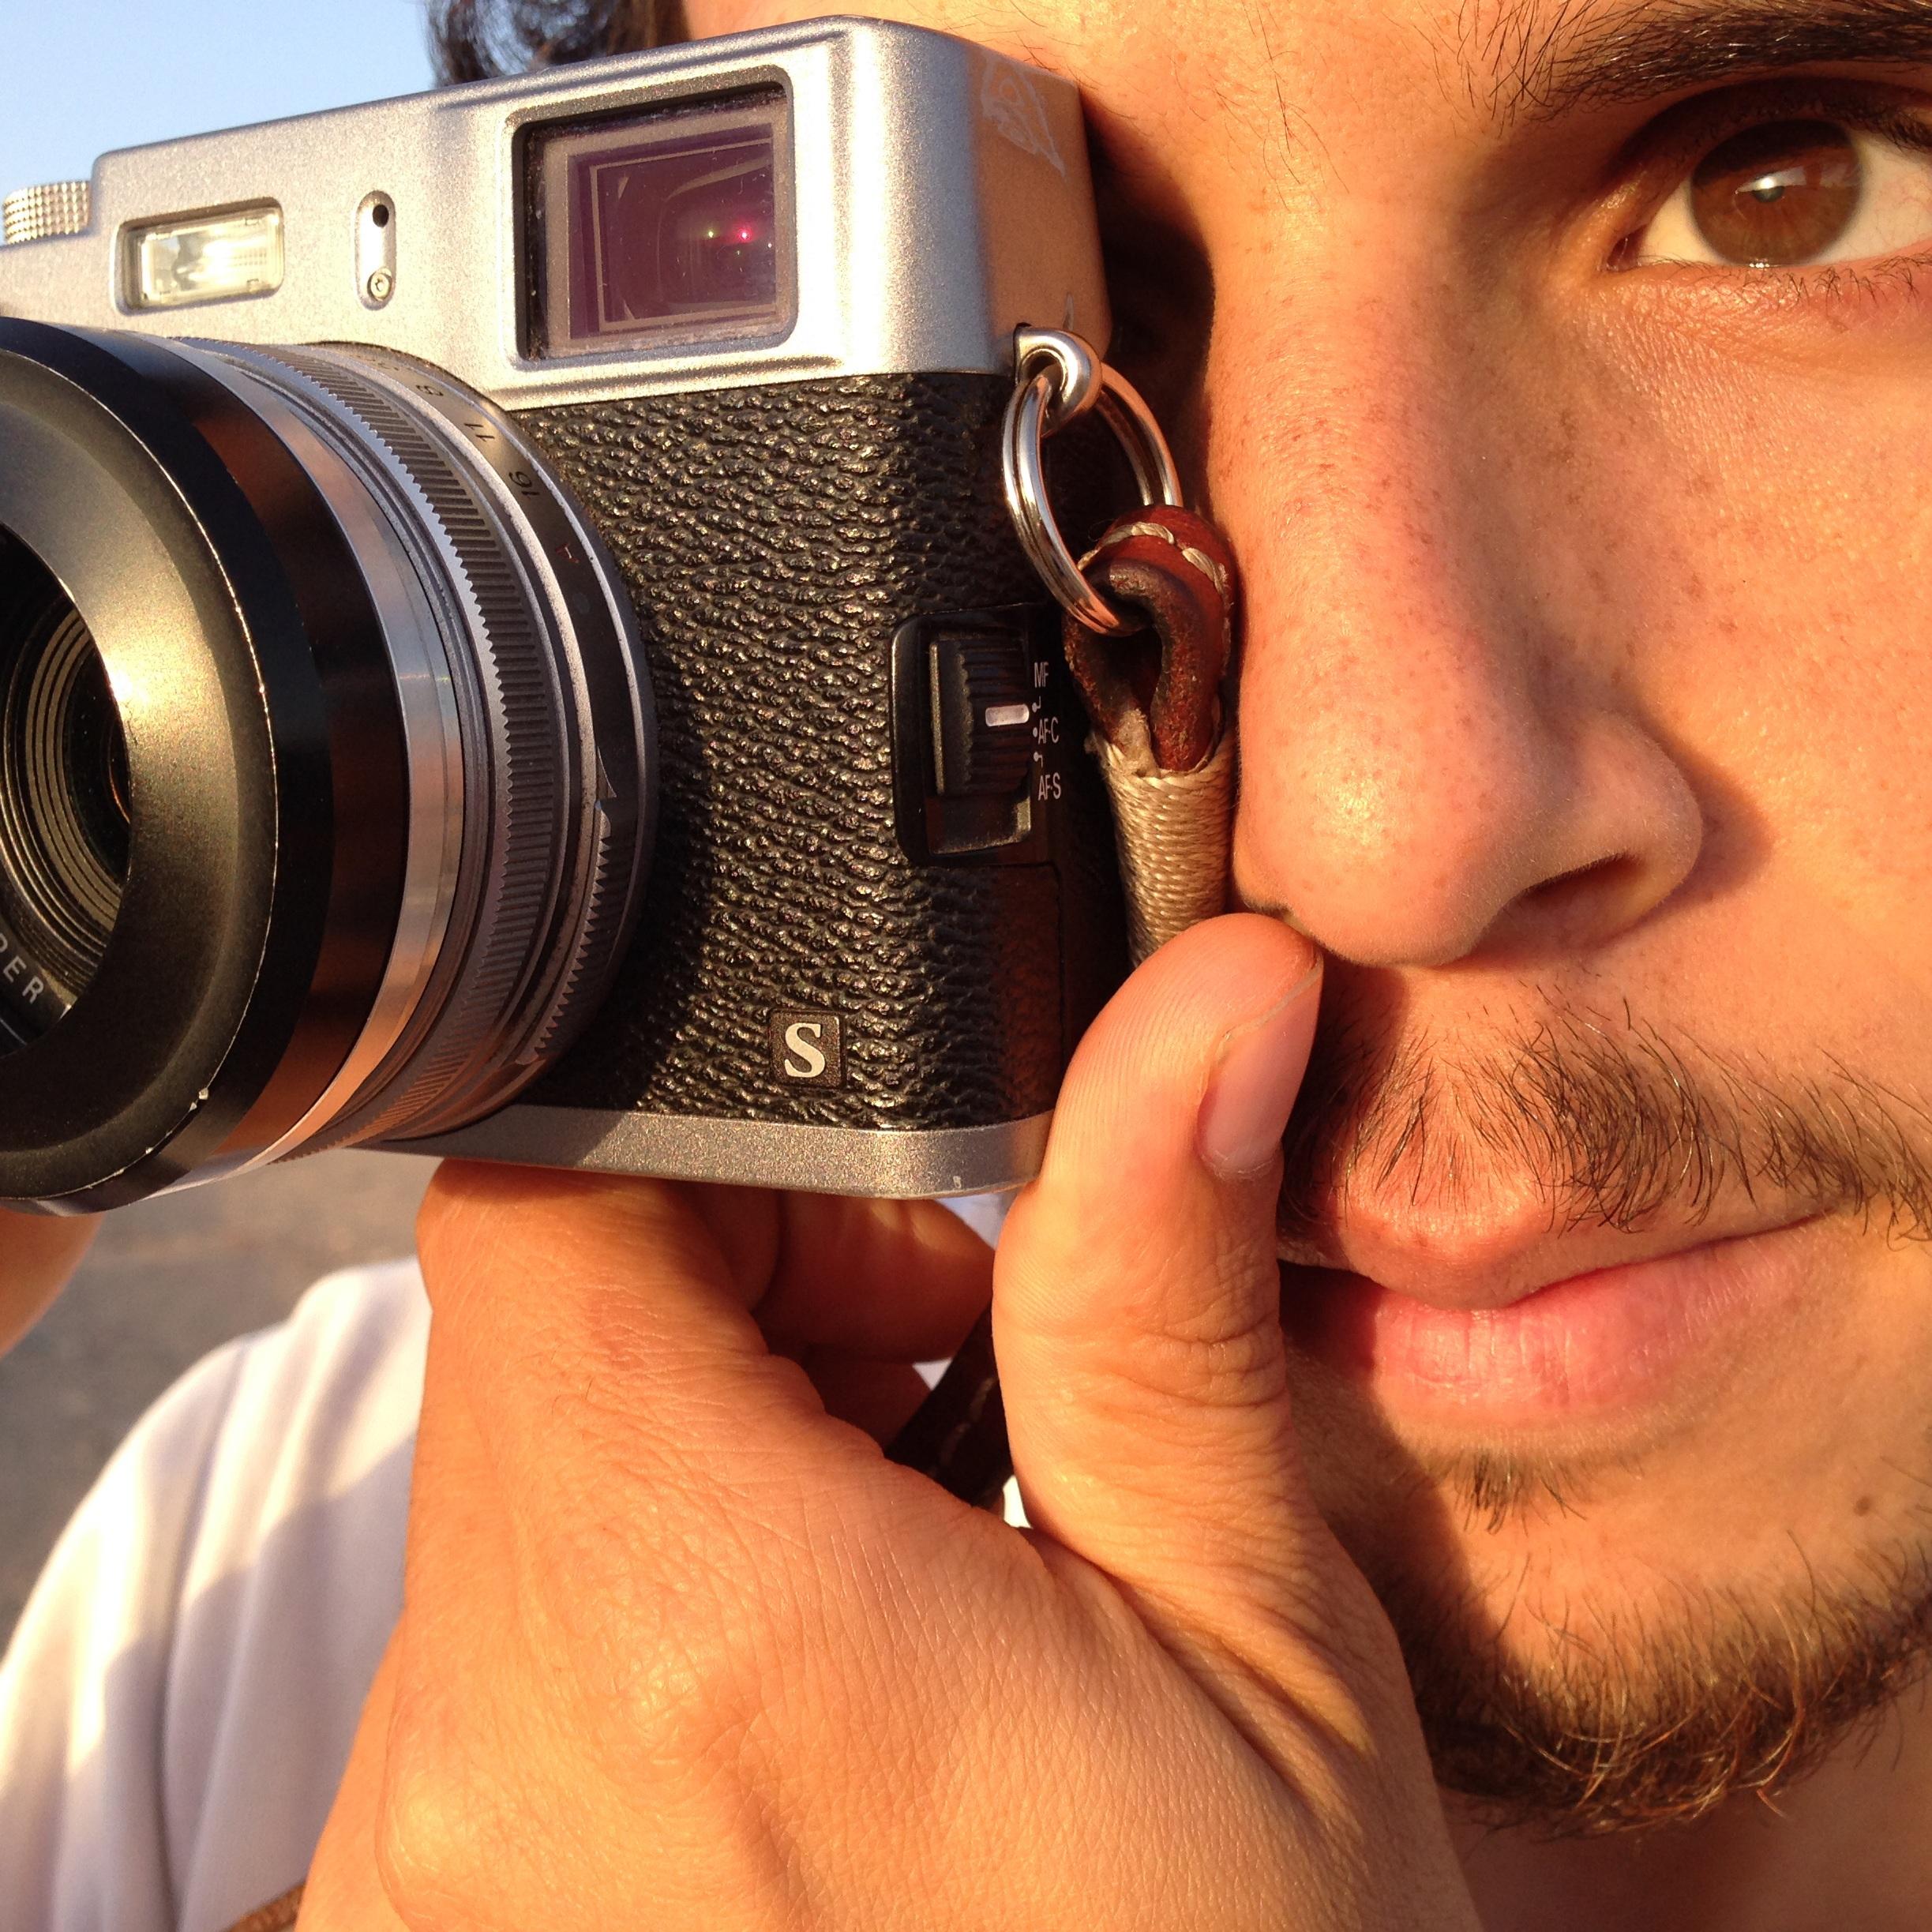 YORIYAS ALAOUI ISMAILI Casablanca, Morocco @EverydayAfrica, @EverydayMiddleEast  yoriyas.com      @yoriyas